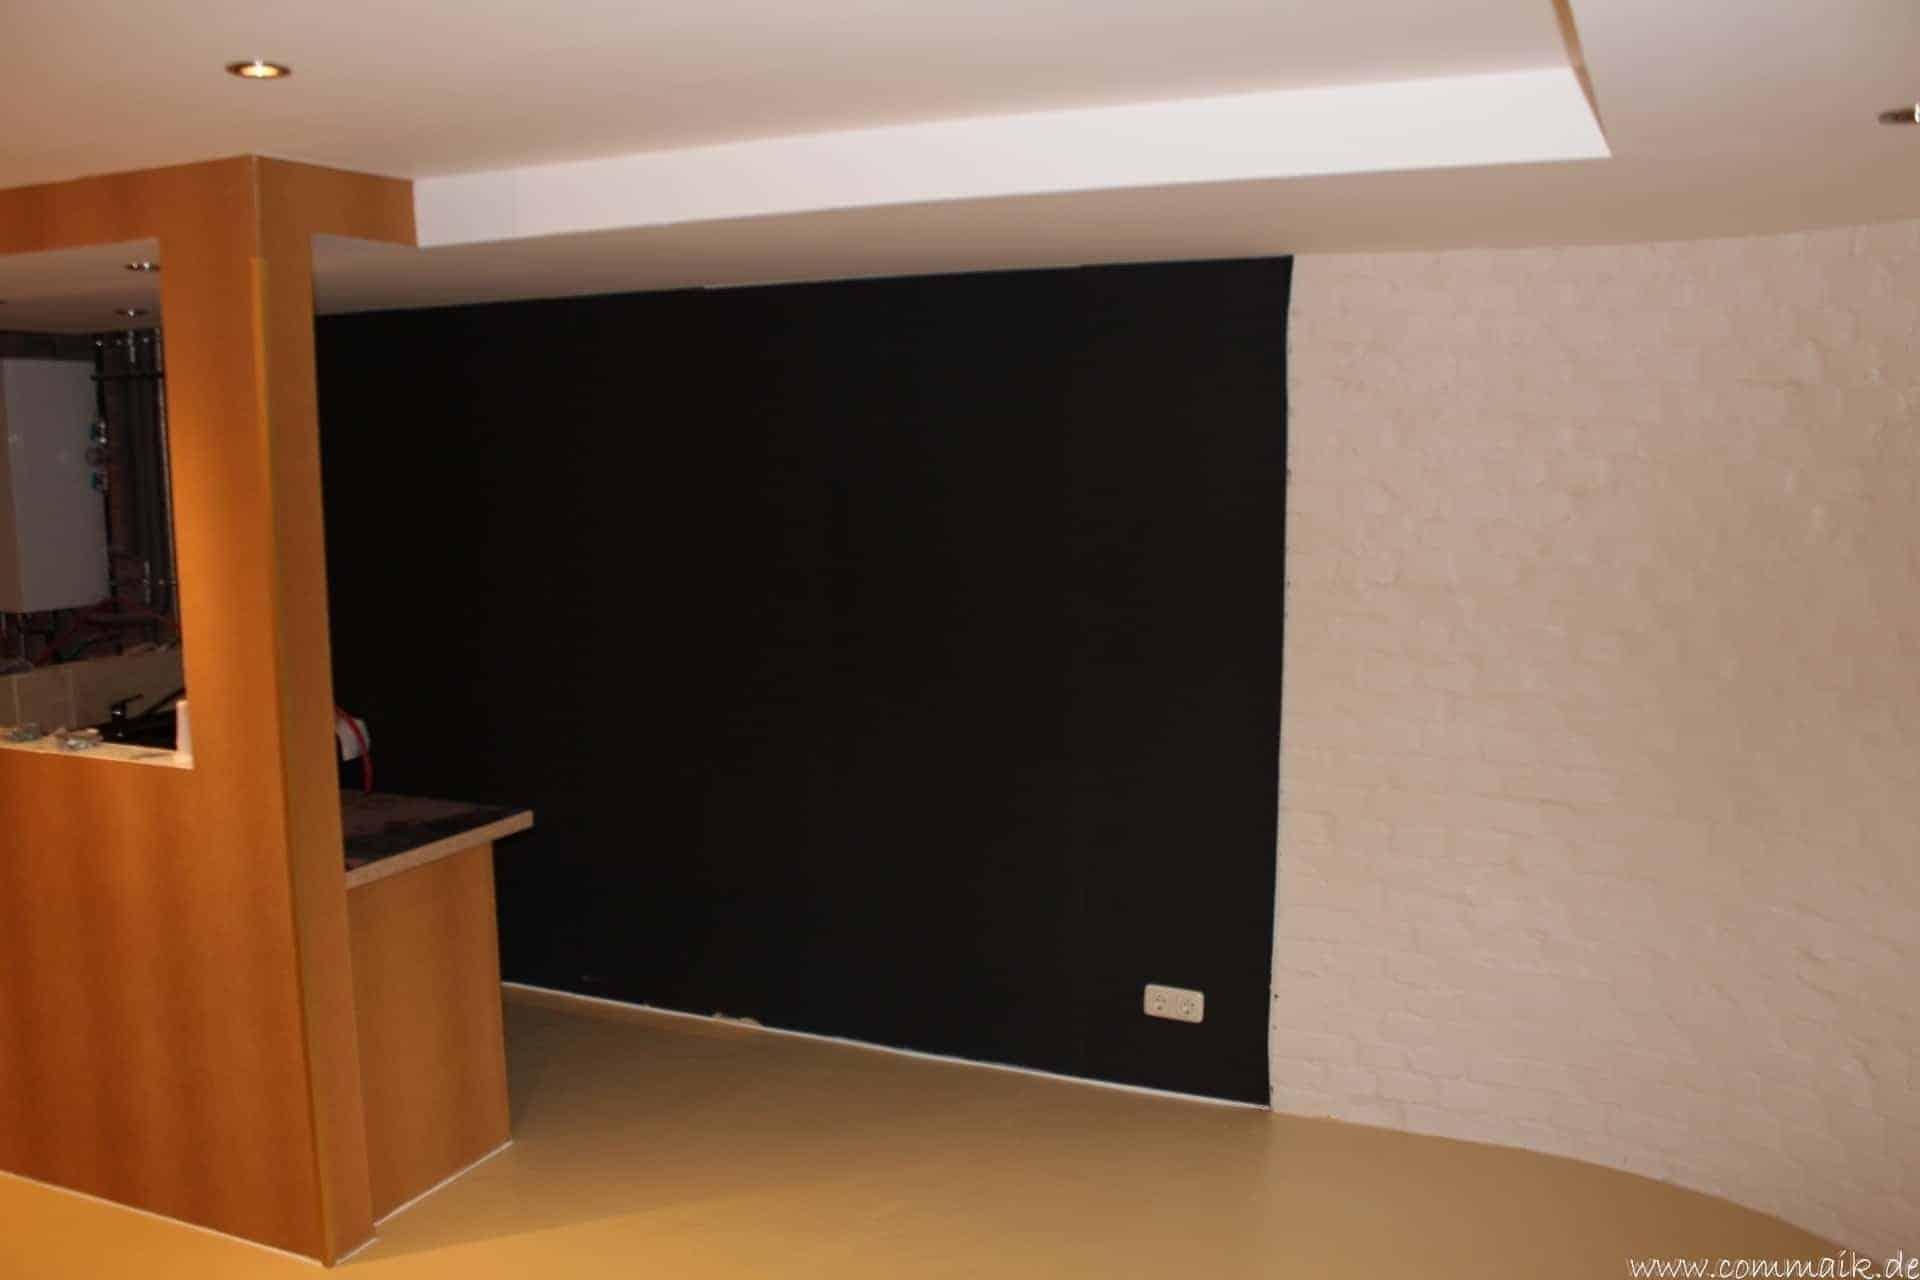 frische farbe im partykeller commaik. Black Bedroom Furniture Sets. Home Design Ideas